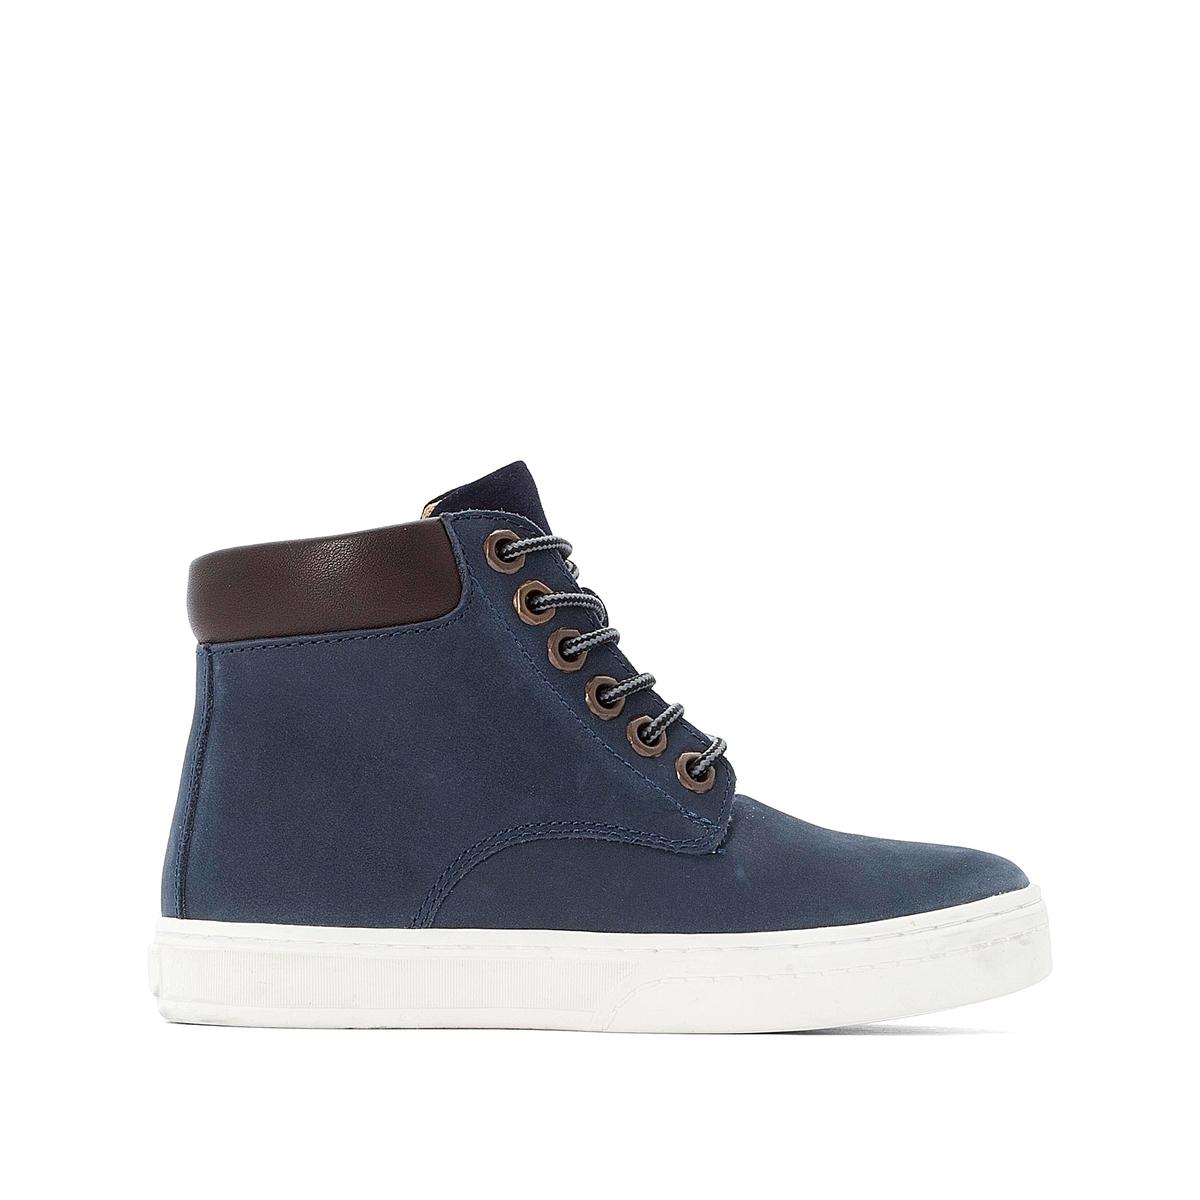 Ботинки LaRedoute Кожаные на шнуровке 26-39 32 синий кеды laredoute кожаные на шнуровке v10 40 белый